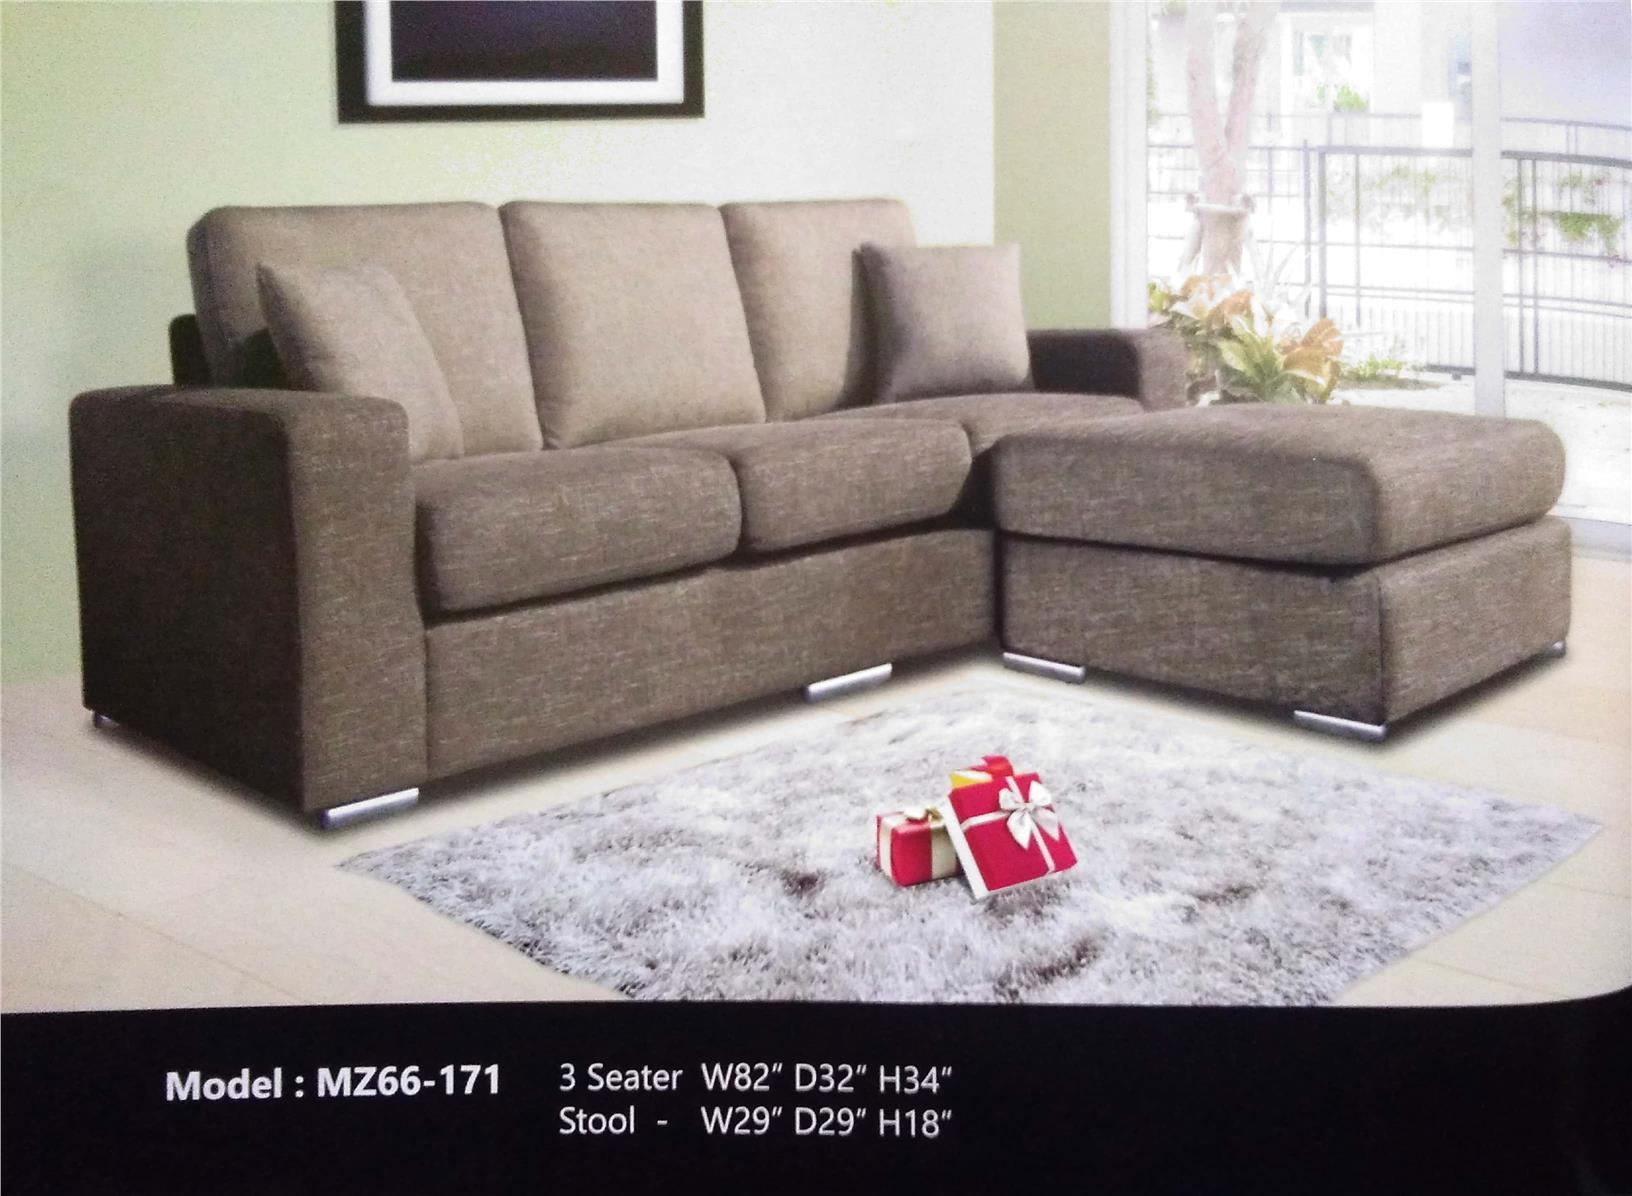 Sofa L Shape Installment Plan Paymen End 6 4 2019 10 15 Am